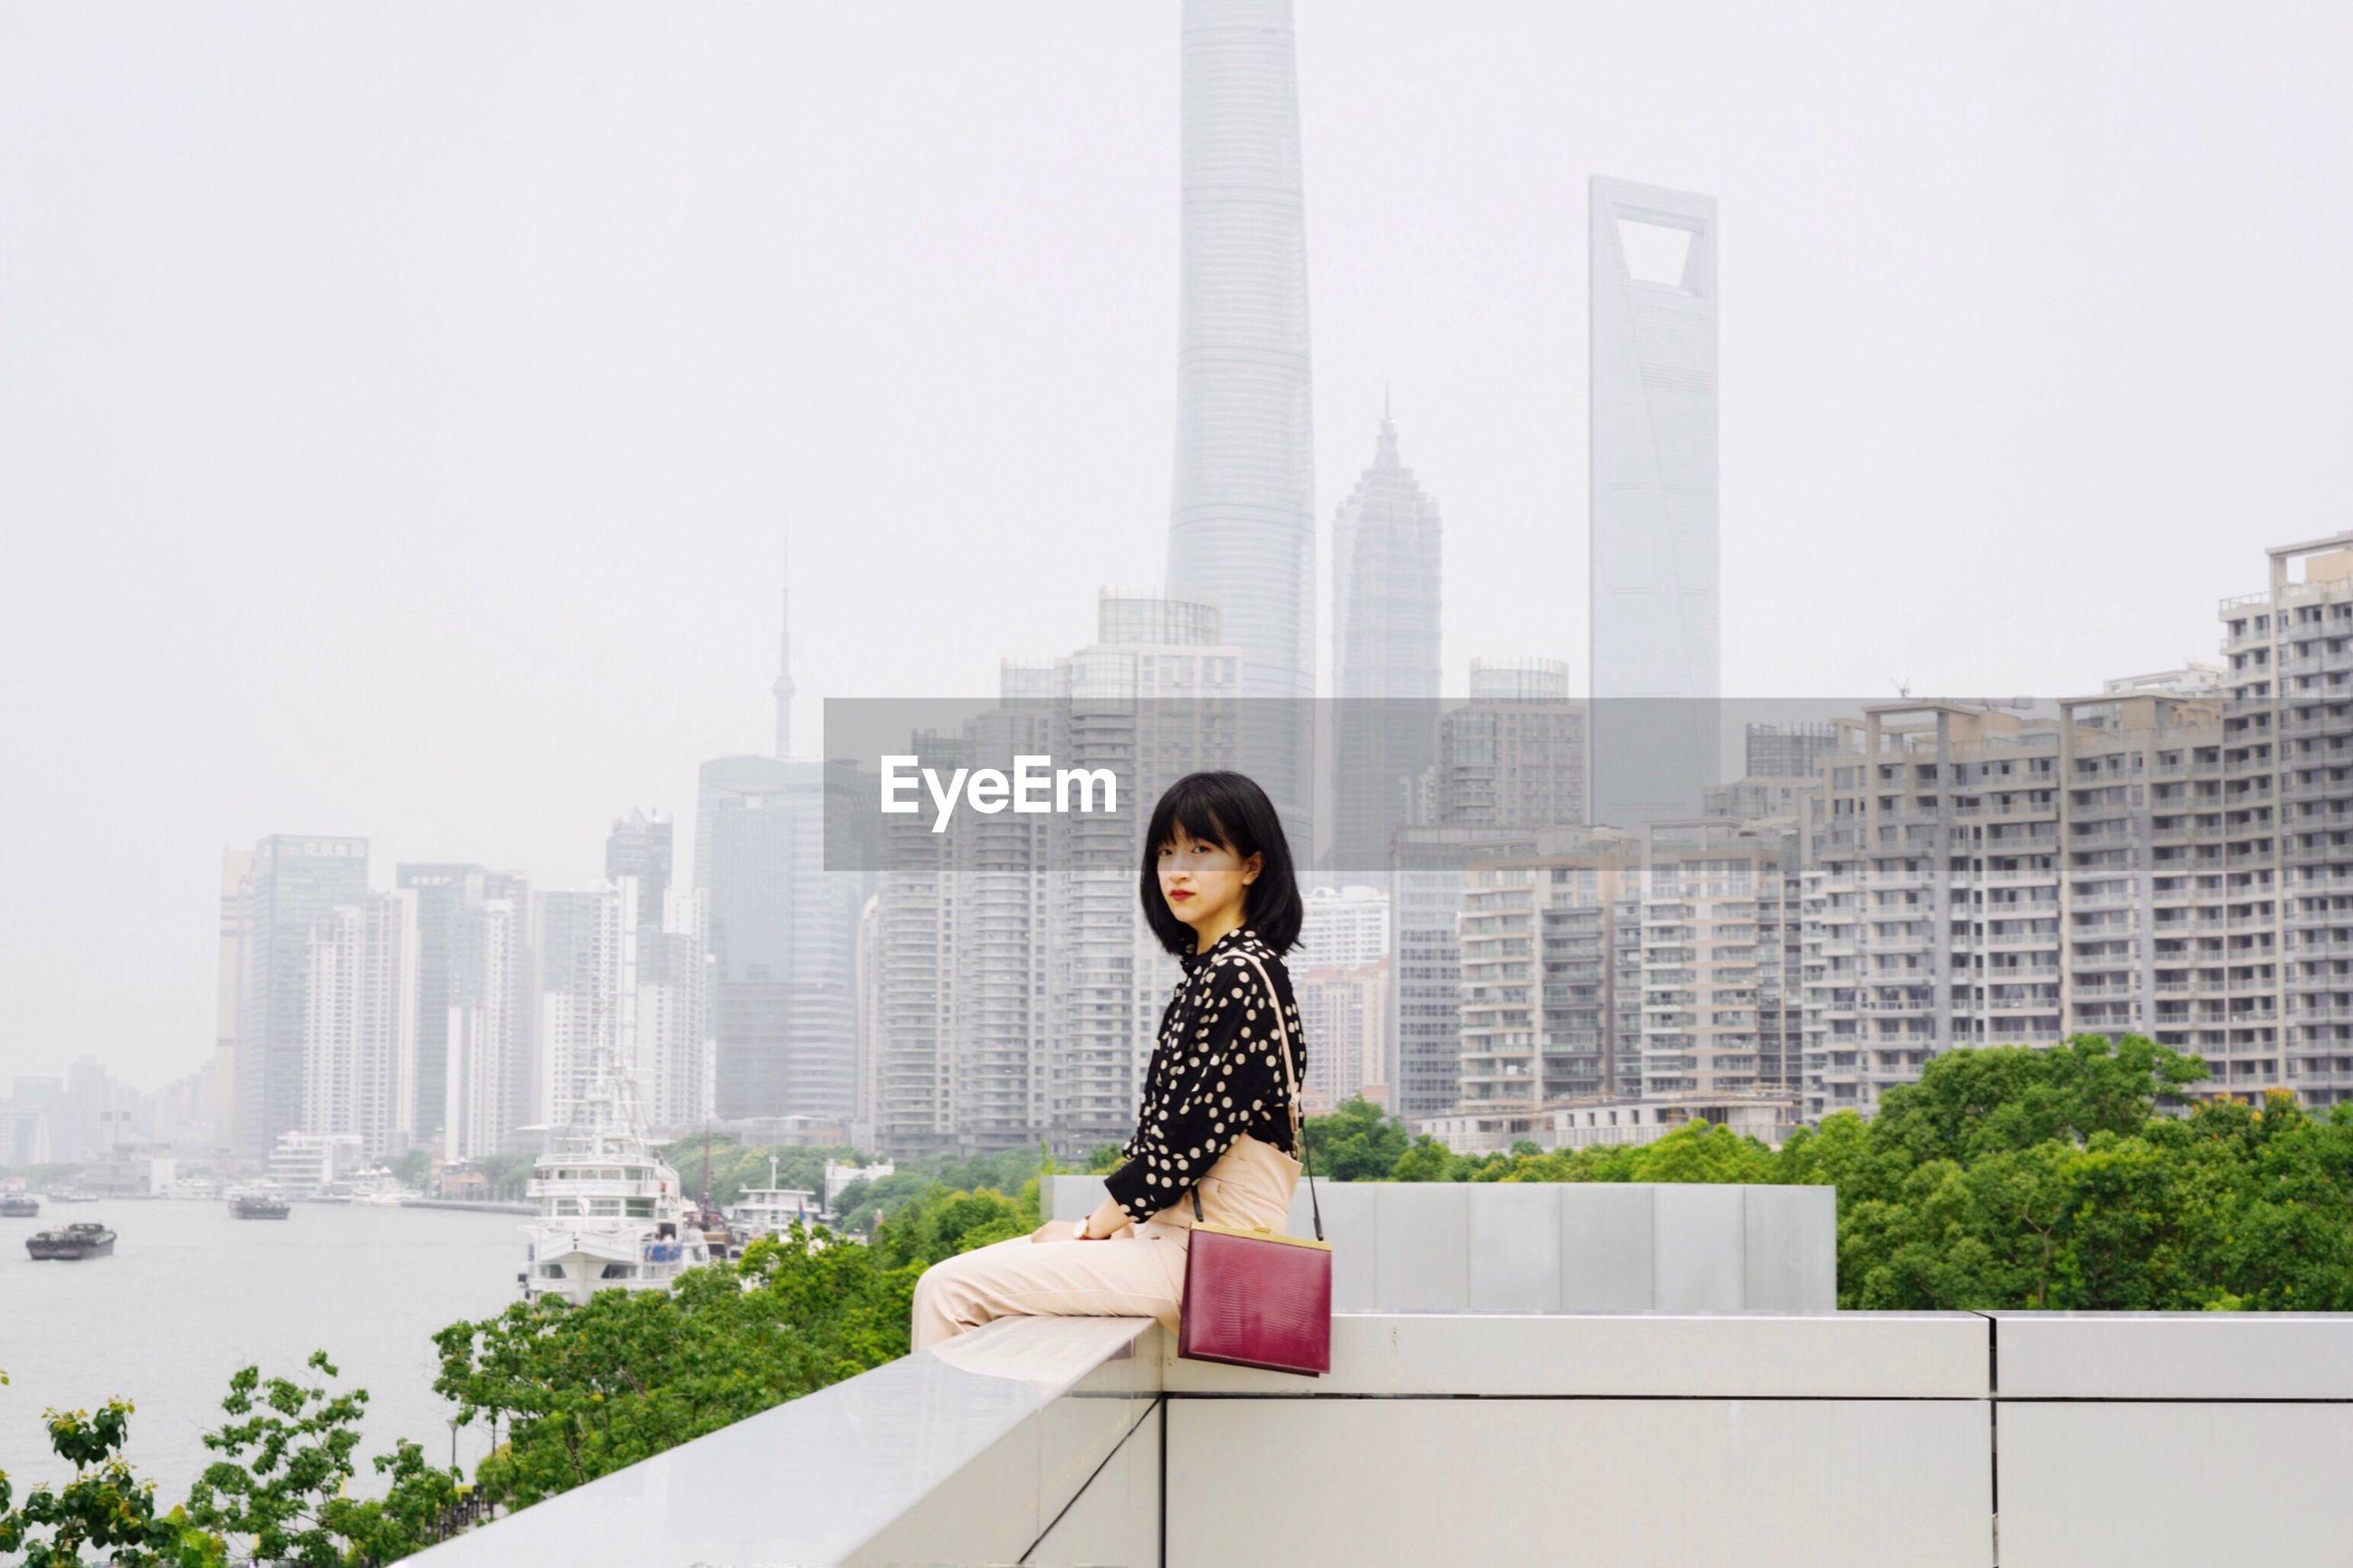 Portrait of woman sitting on buildings terrace against sky